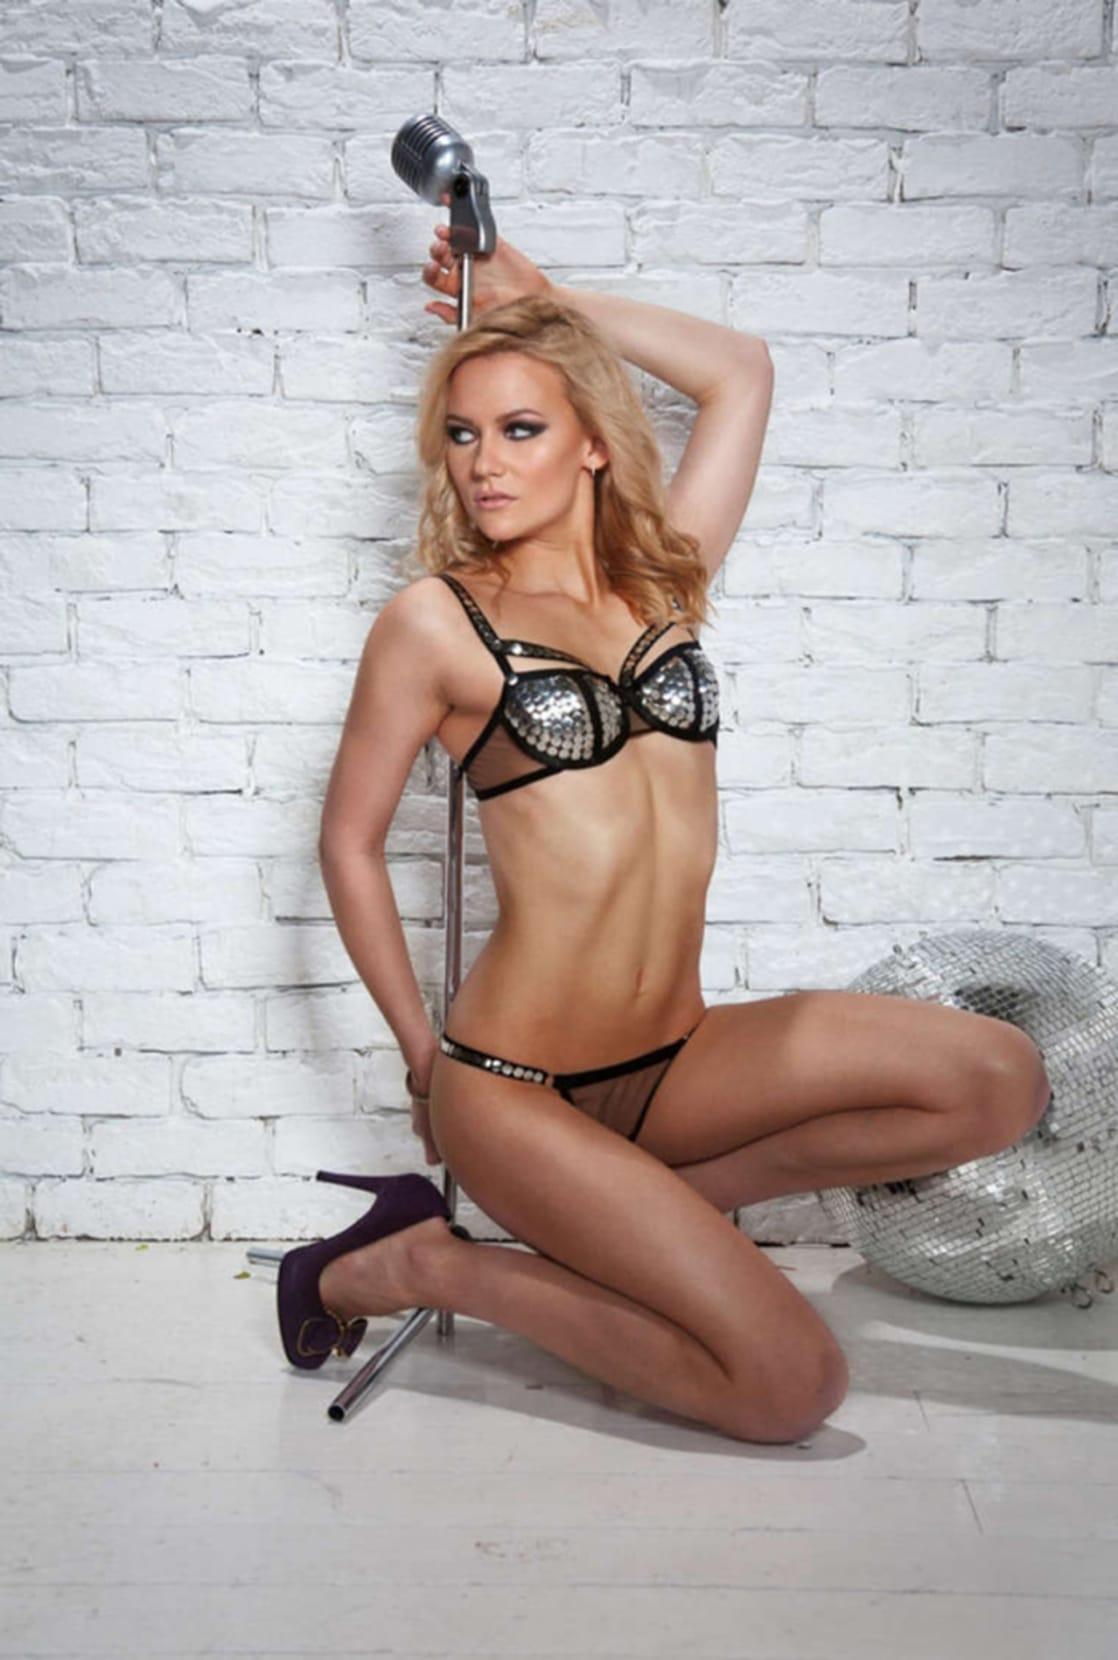 Fotos Alexandra Saitova nudes (66 photo), Sexy, Bikini, Instagram, cameltoe 2006